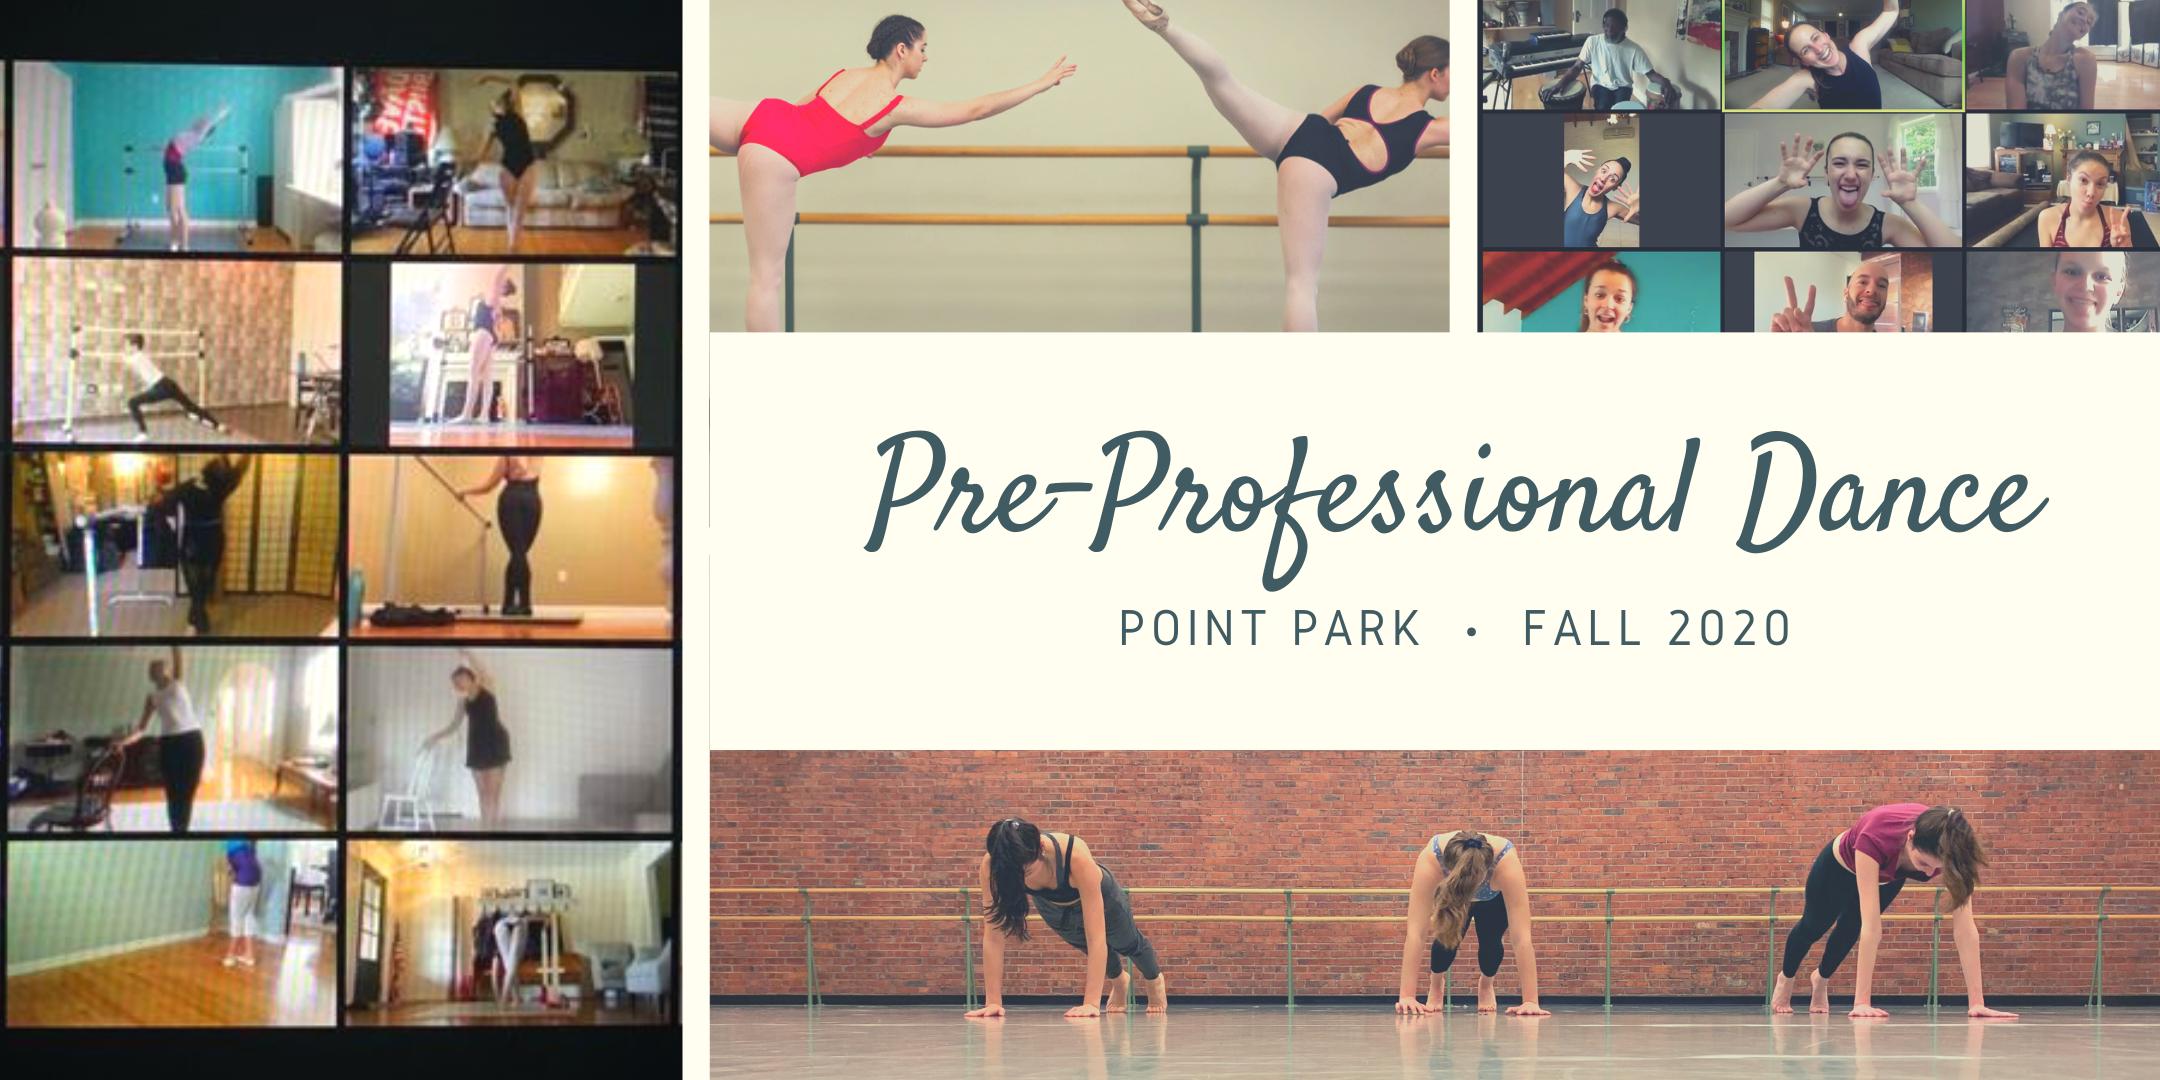 Business - Art   Point Park University Online Community Classes - Fall 2020